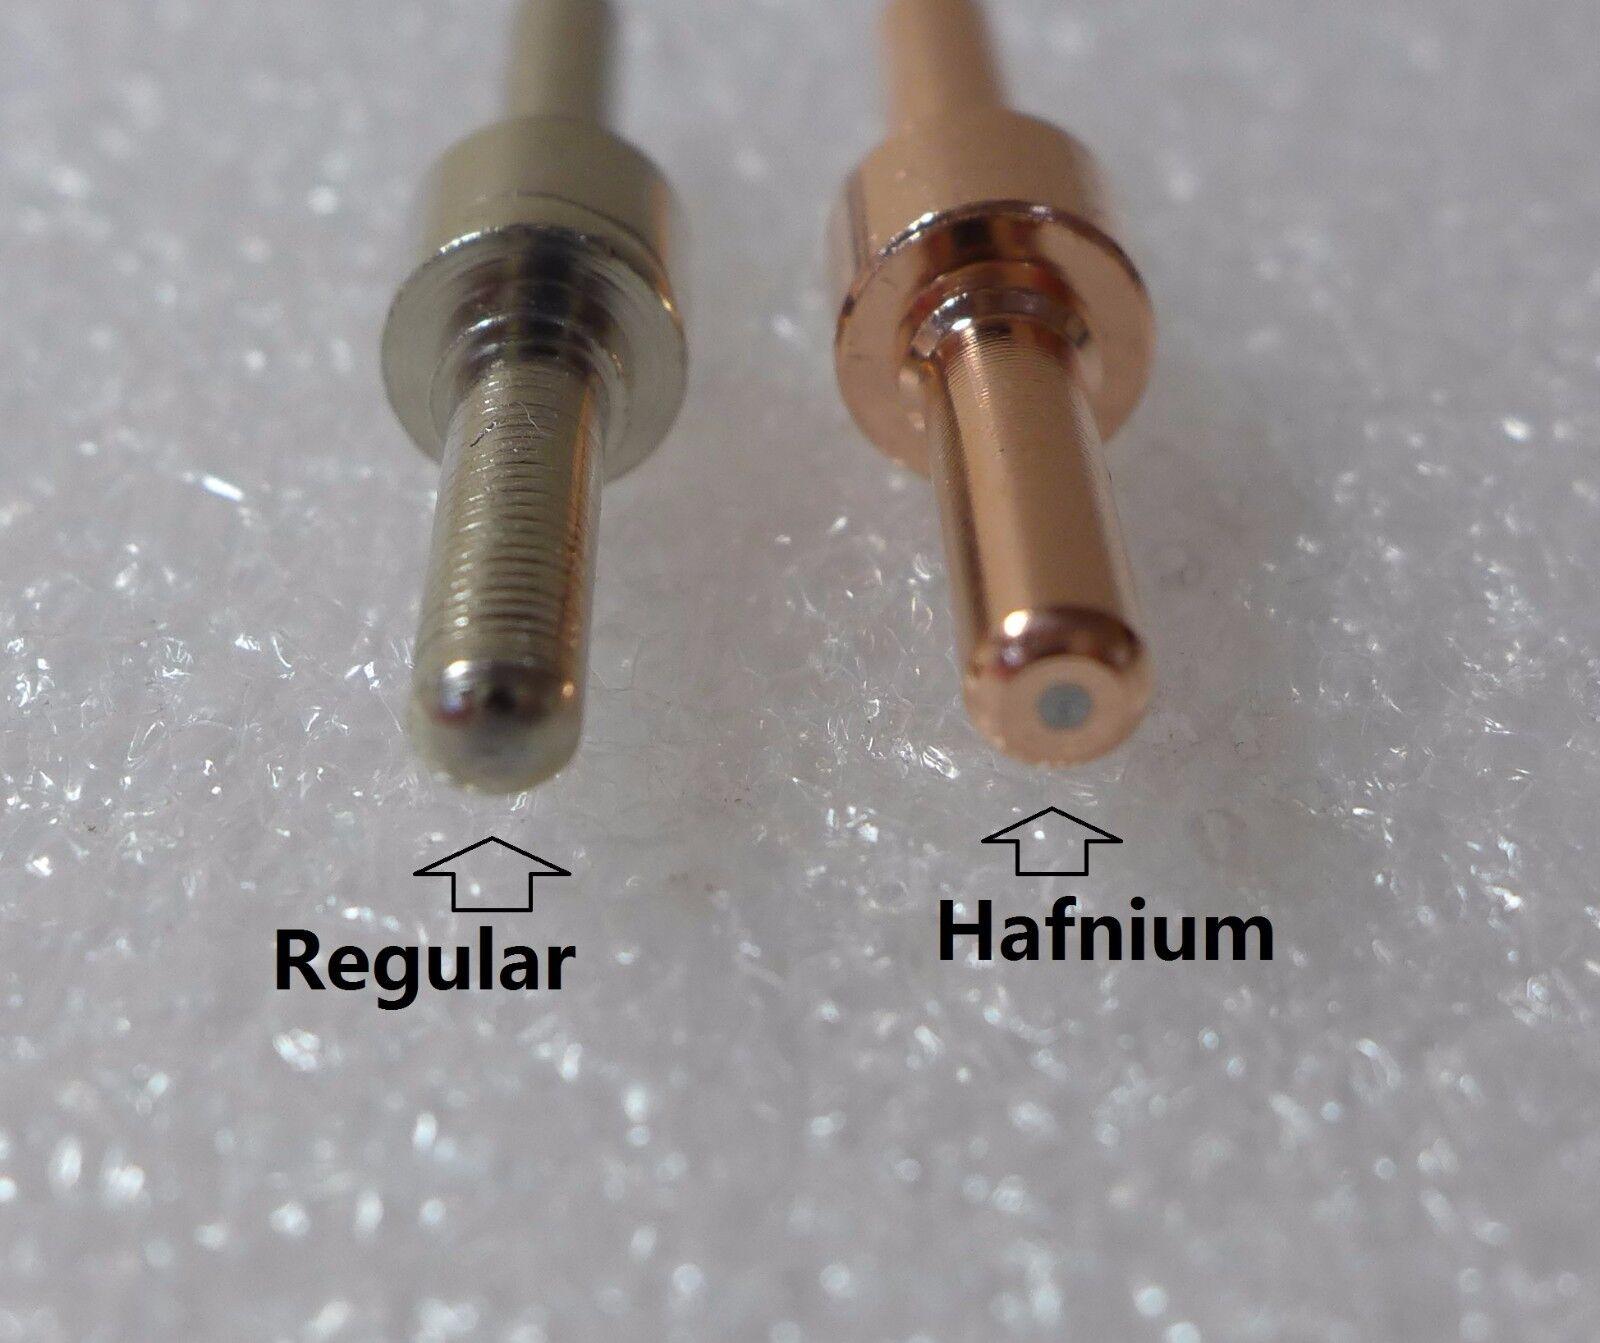 58pcs Hafnium short tip electrode LOTOS LT5000D Plasma